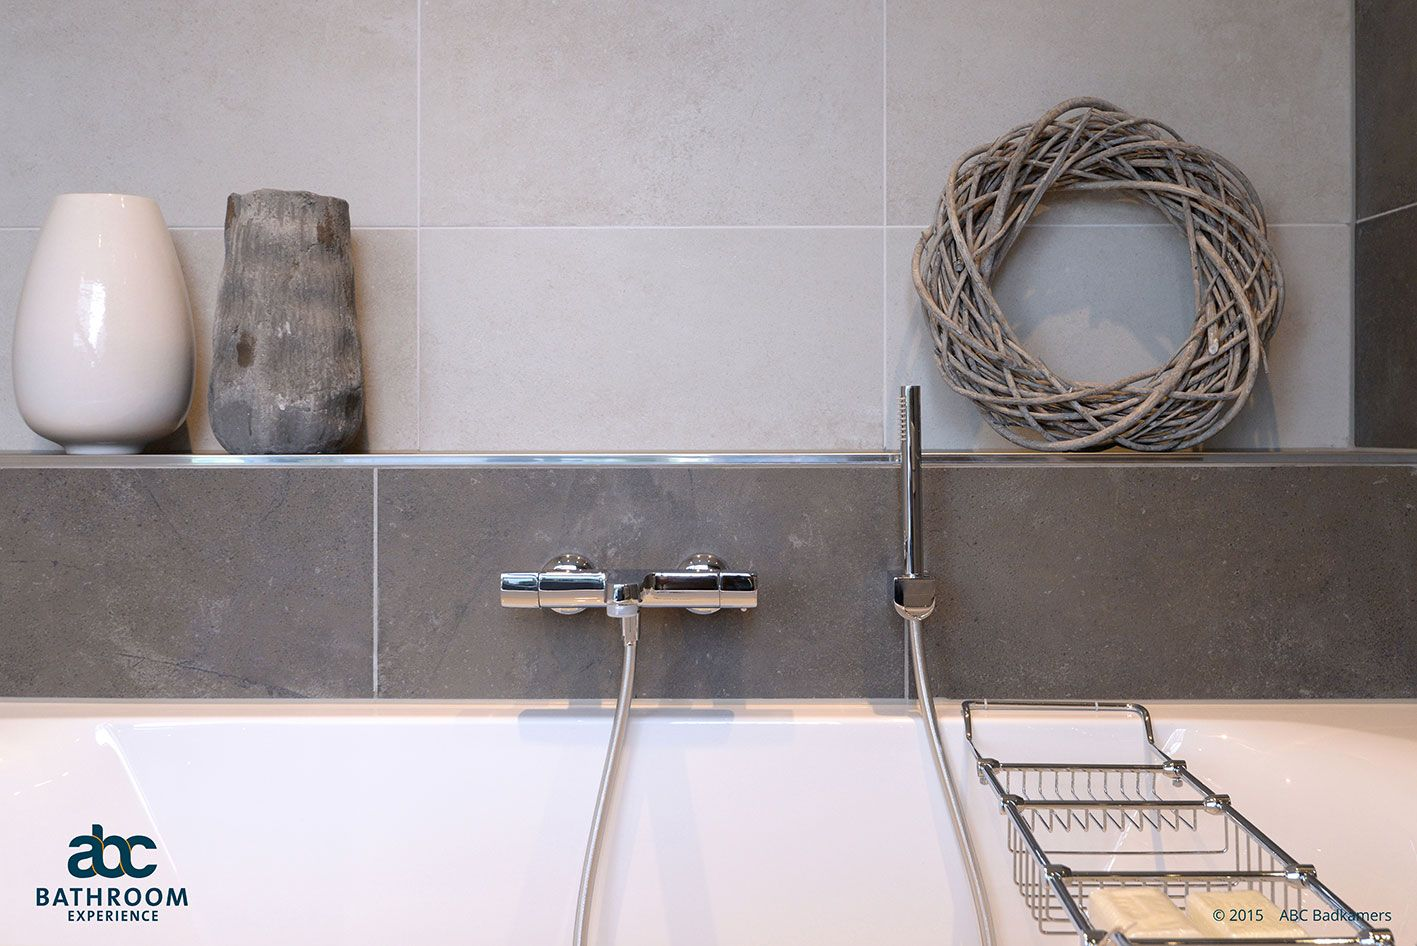 Nano Coating Badkamer : Inspiratie abc badkamers deventer sanitair en tegels badkamer